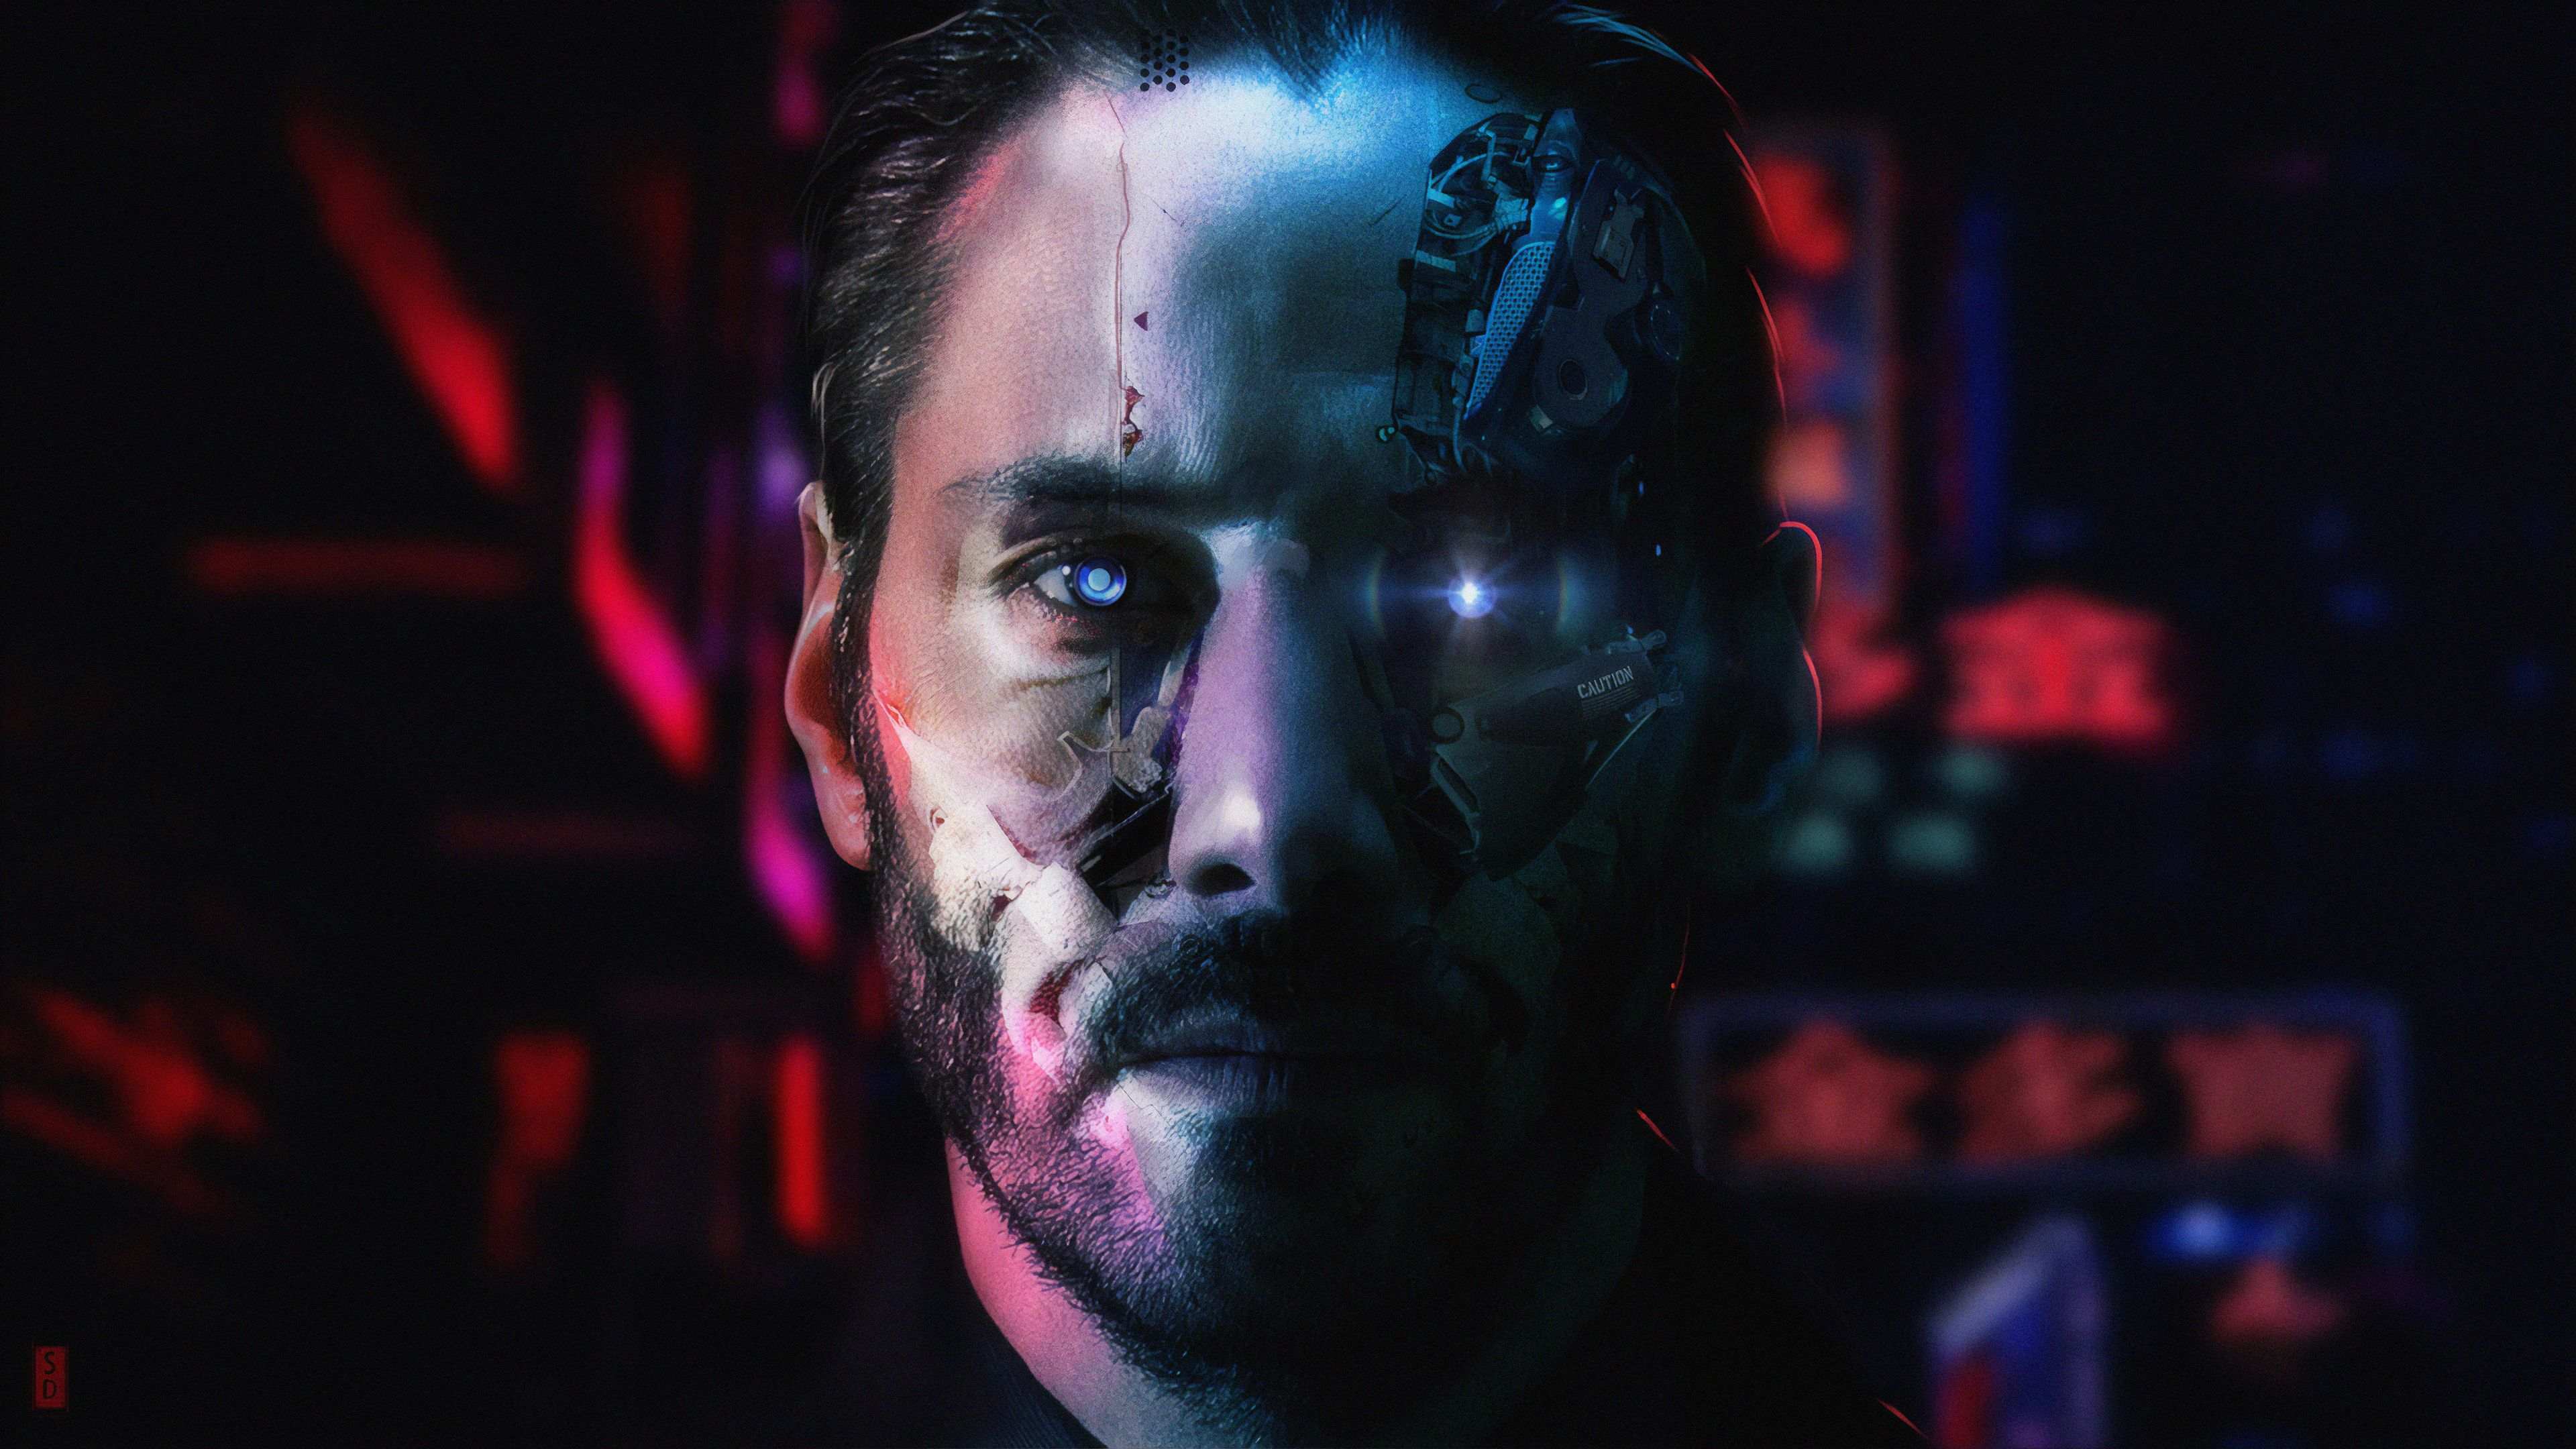 John Wick Excommunicado John Wick Wallpapers Hd Wallpapers Cyberpunk 2077 Wallpapers 4k Wallpapers Cyberpunk Cyberpunk Aesthetic Cyberpunk 2077